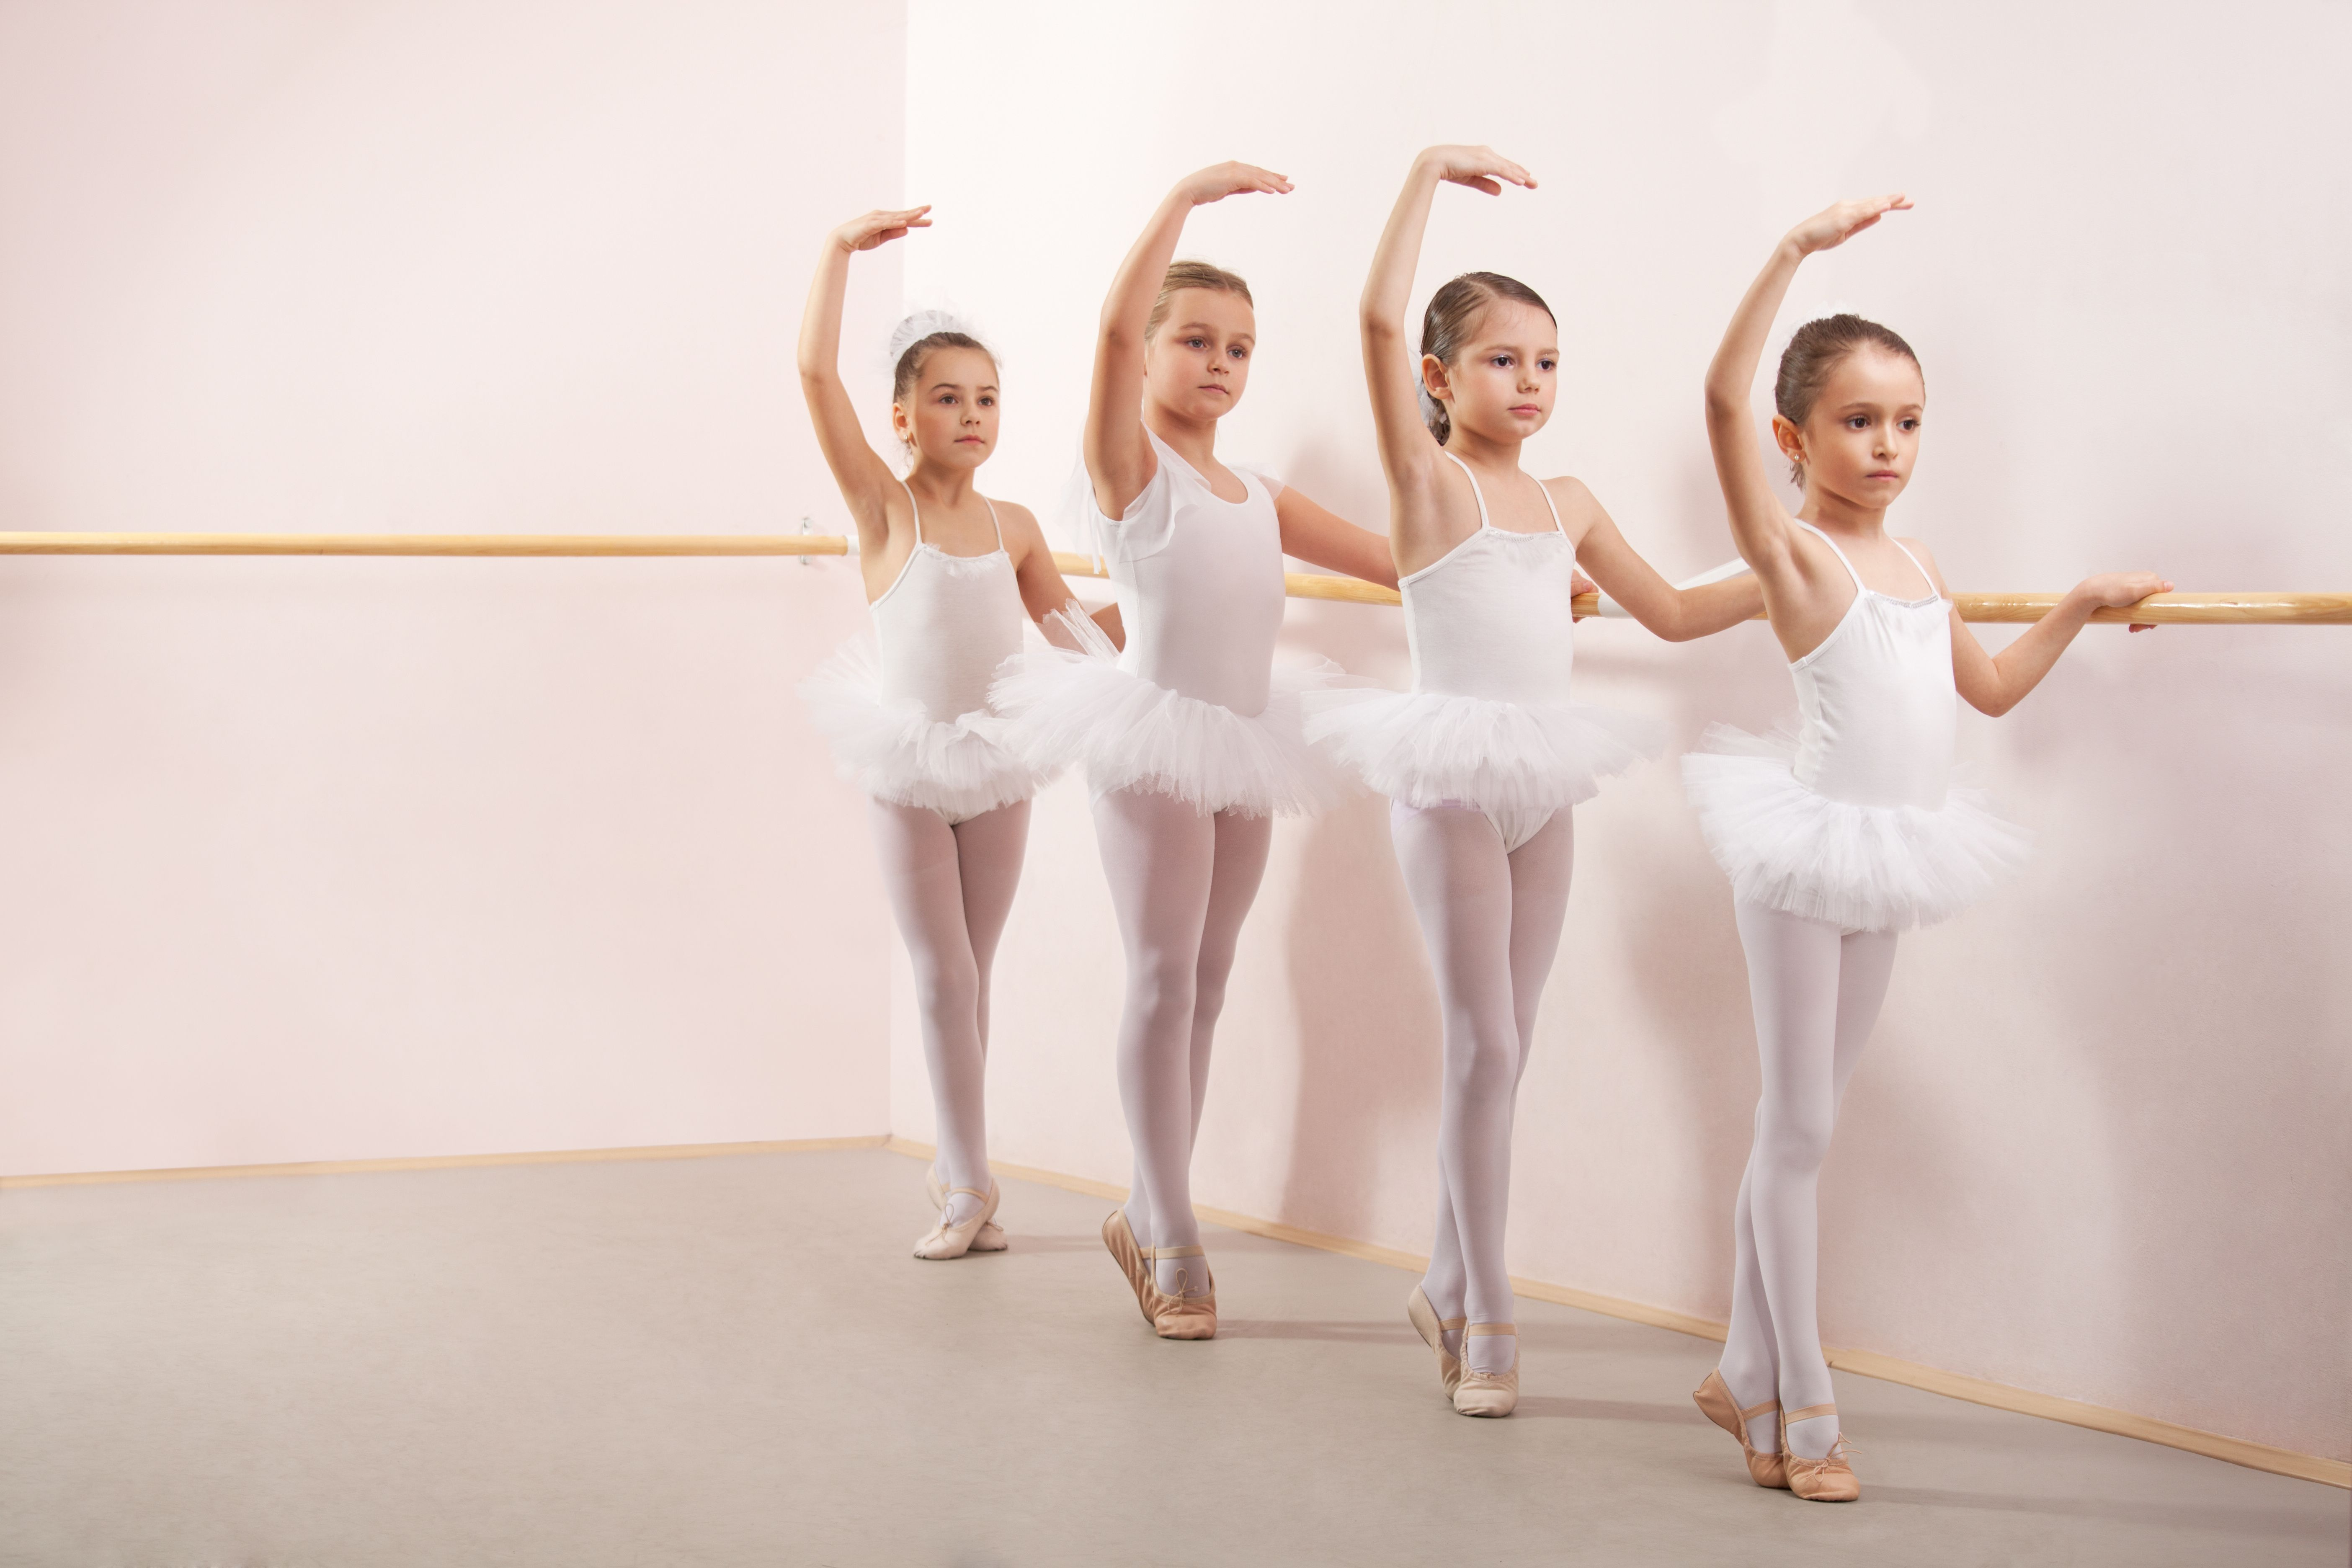 Group of four little ballerinas practicing | Balet | Pinterest